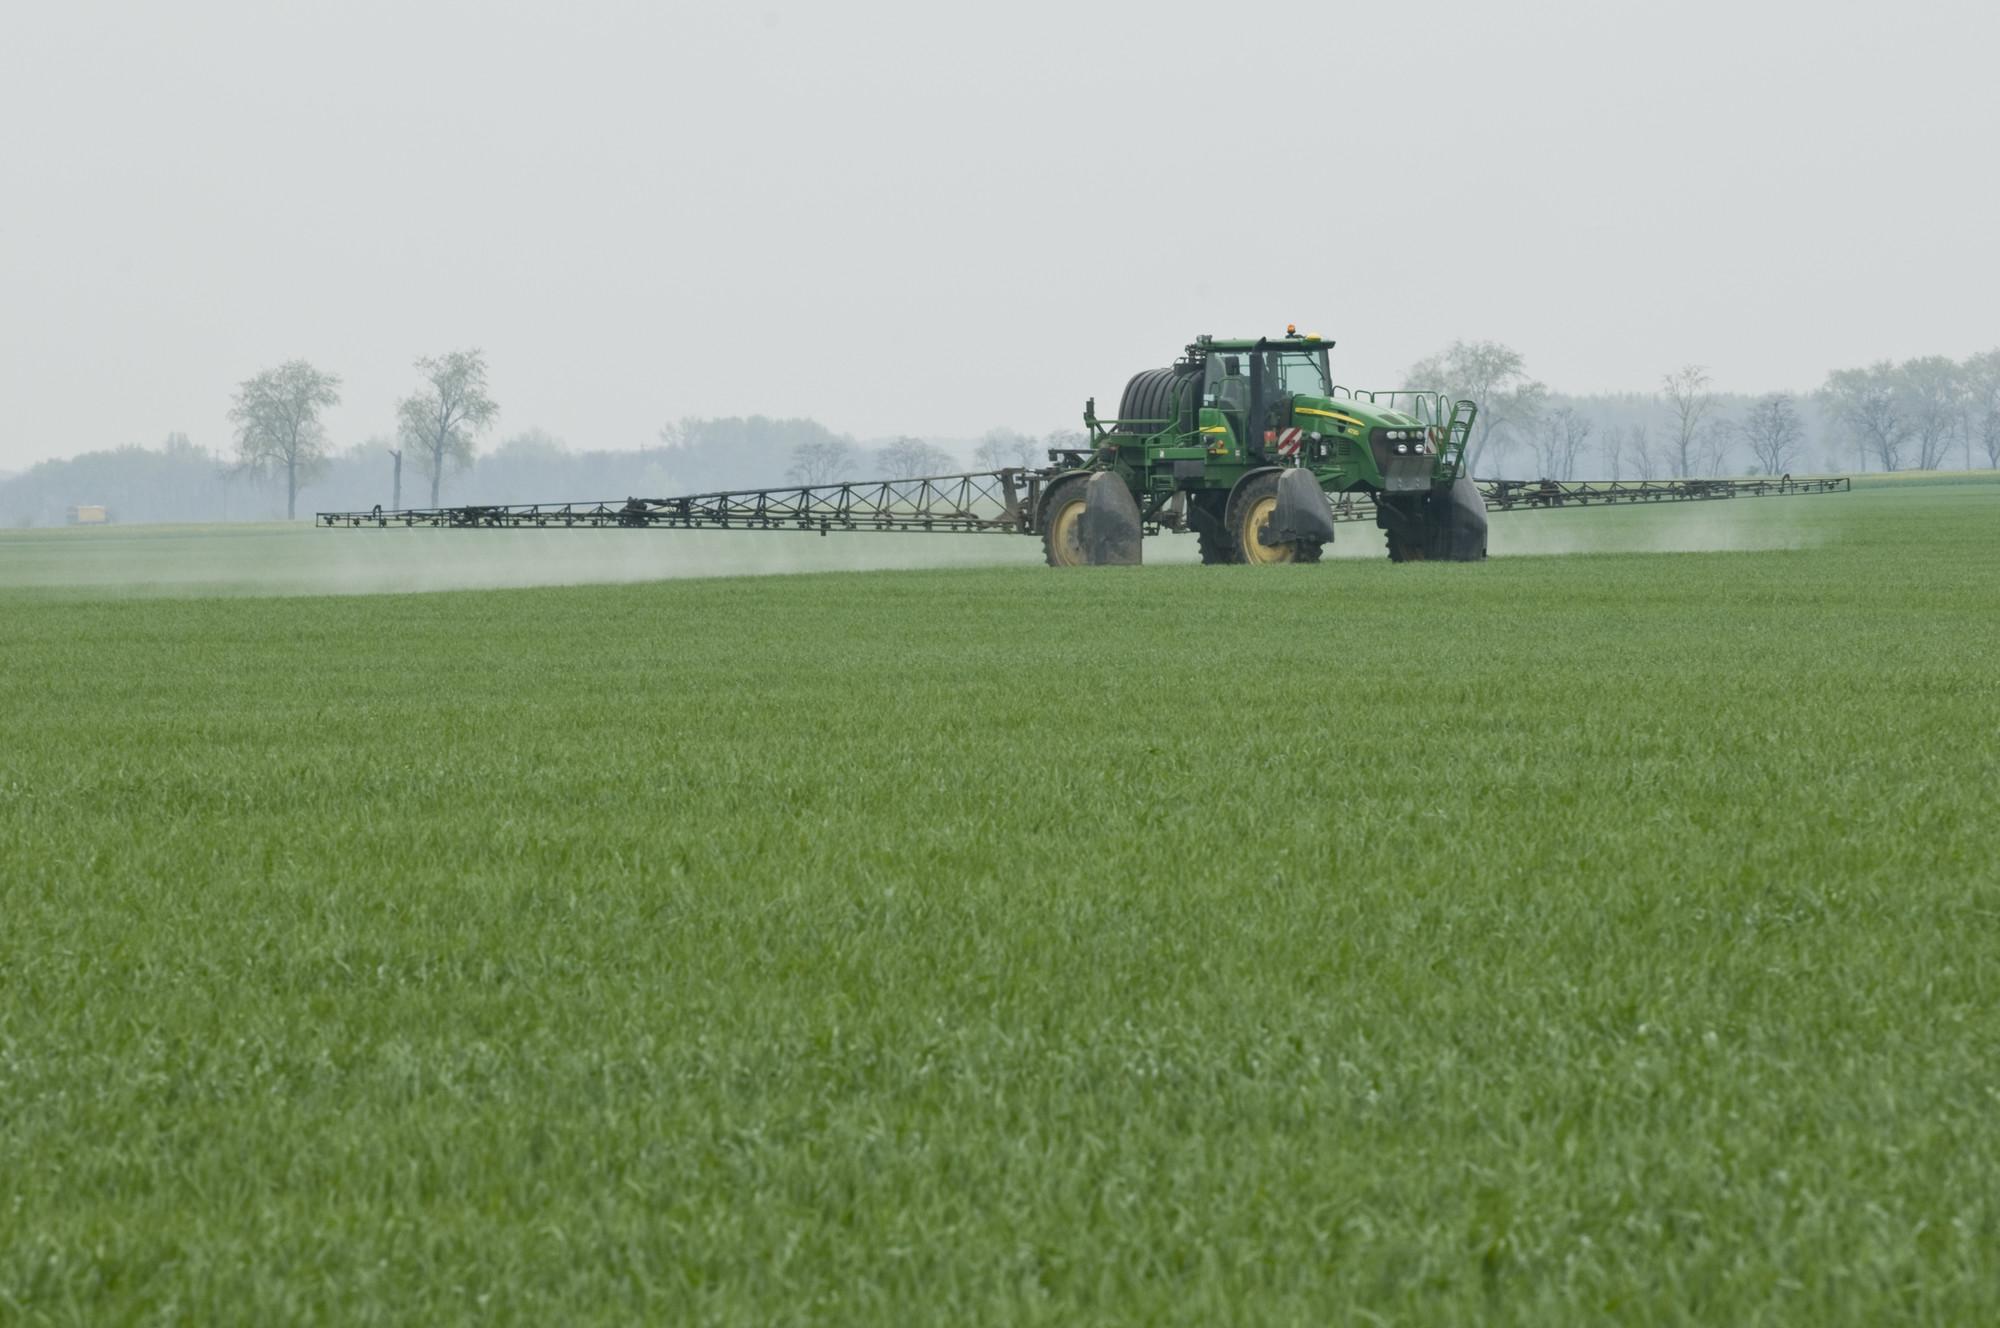 Traktor der Pestizide am Feld ausbringt